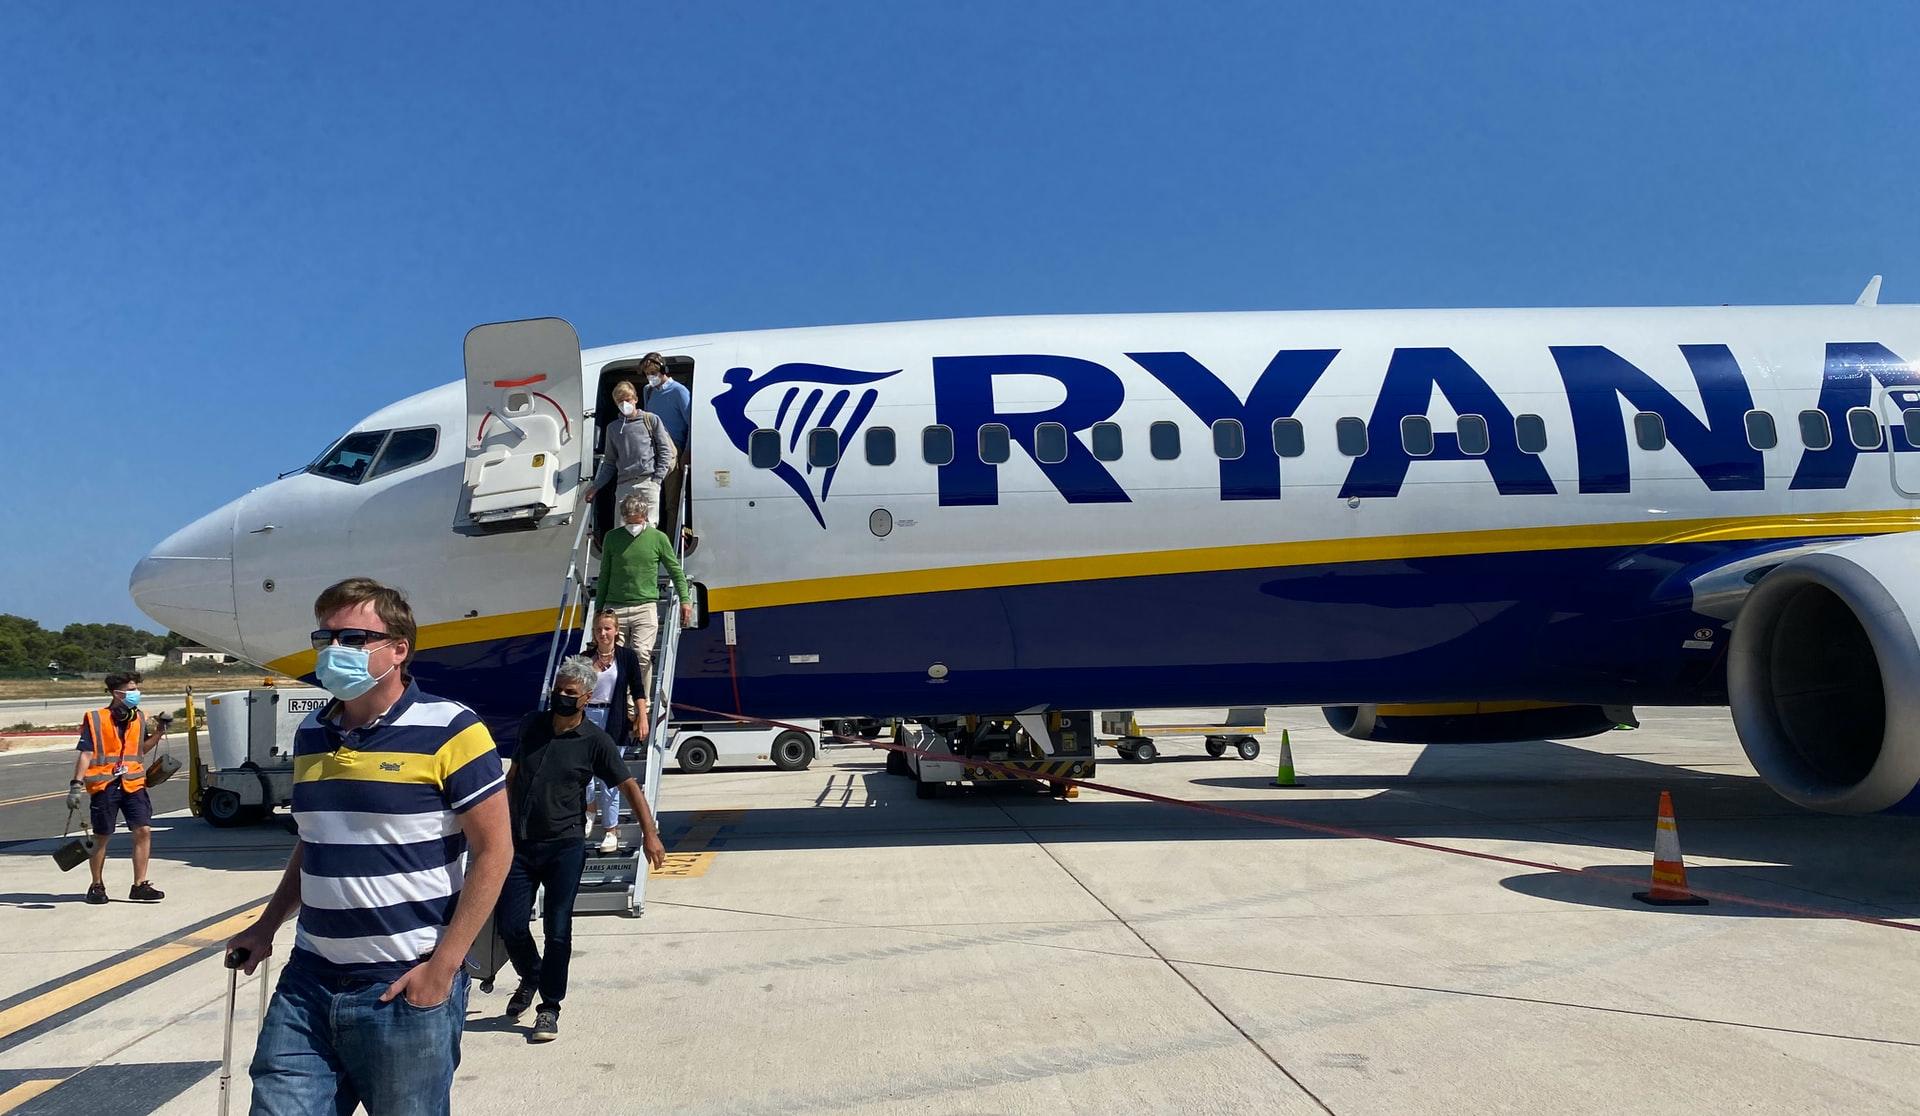 Ryanair объявил летнюю распродажу: билеты от 8 евро